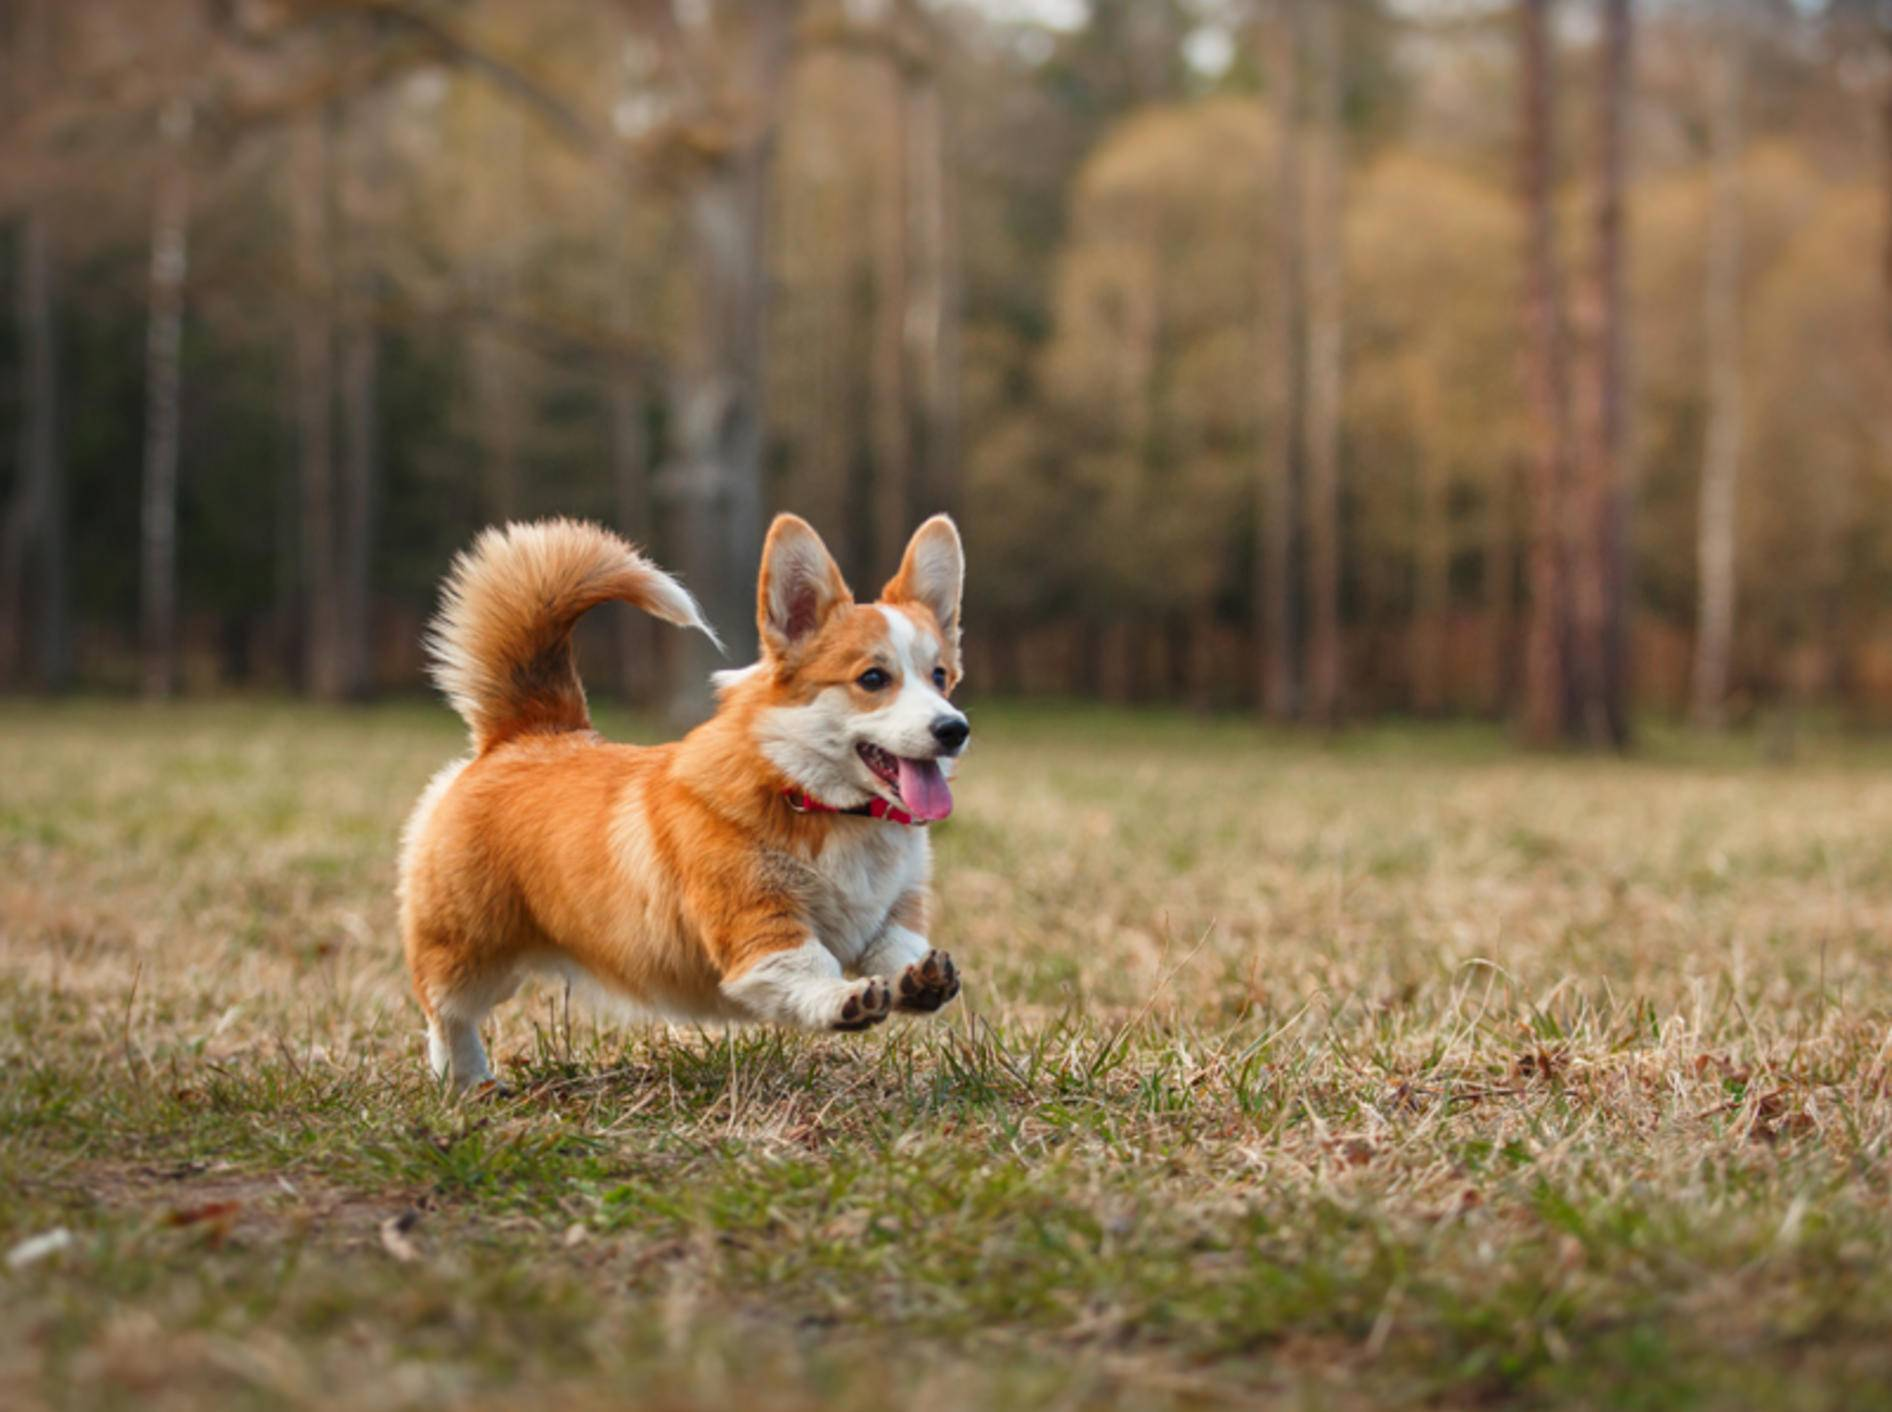 Der Corgi braucht trotz kurzer Beinchen viel Bewegung – Shutterstock / dezi